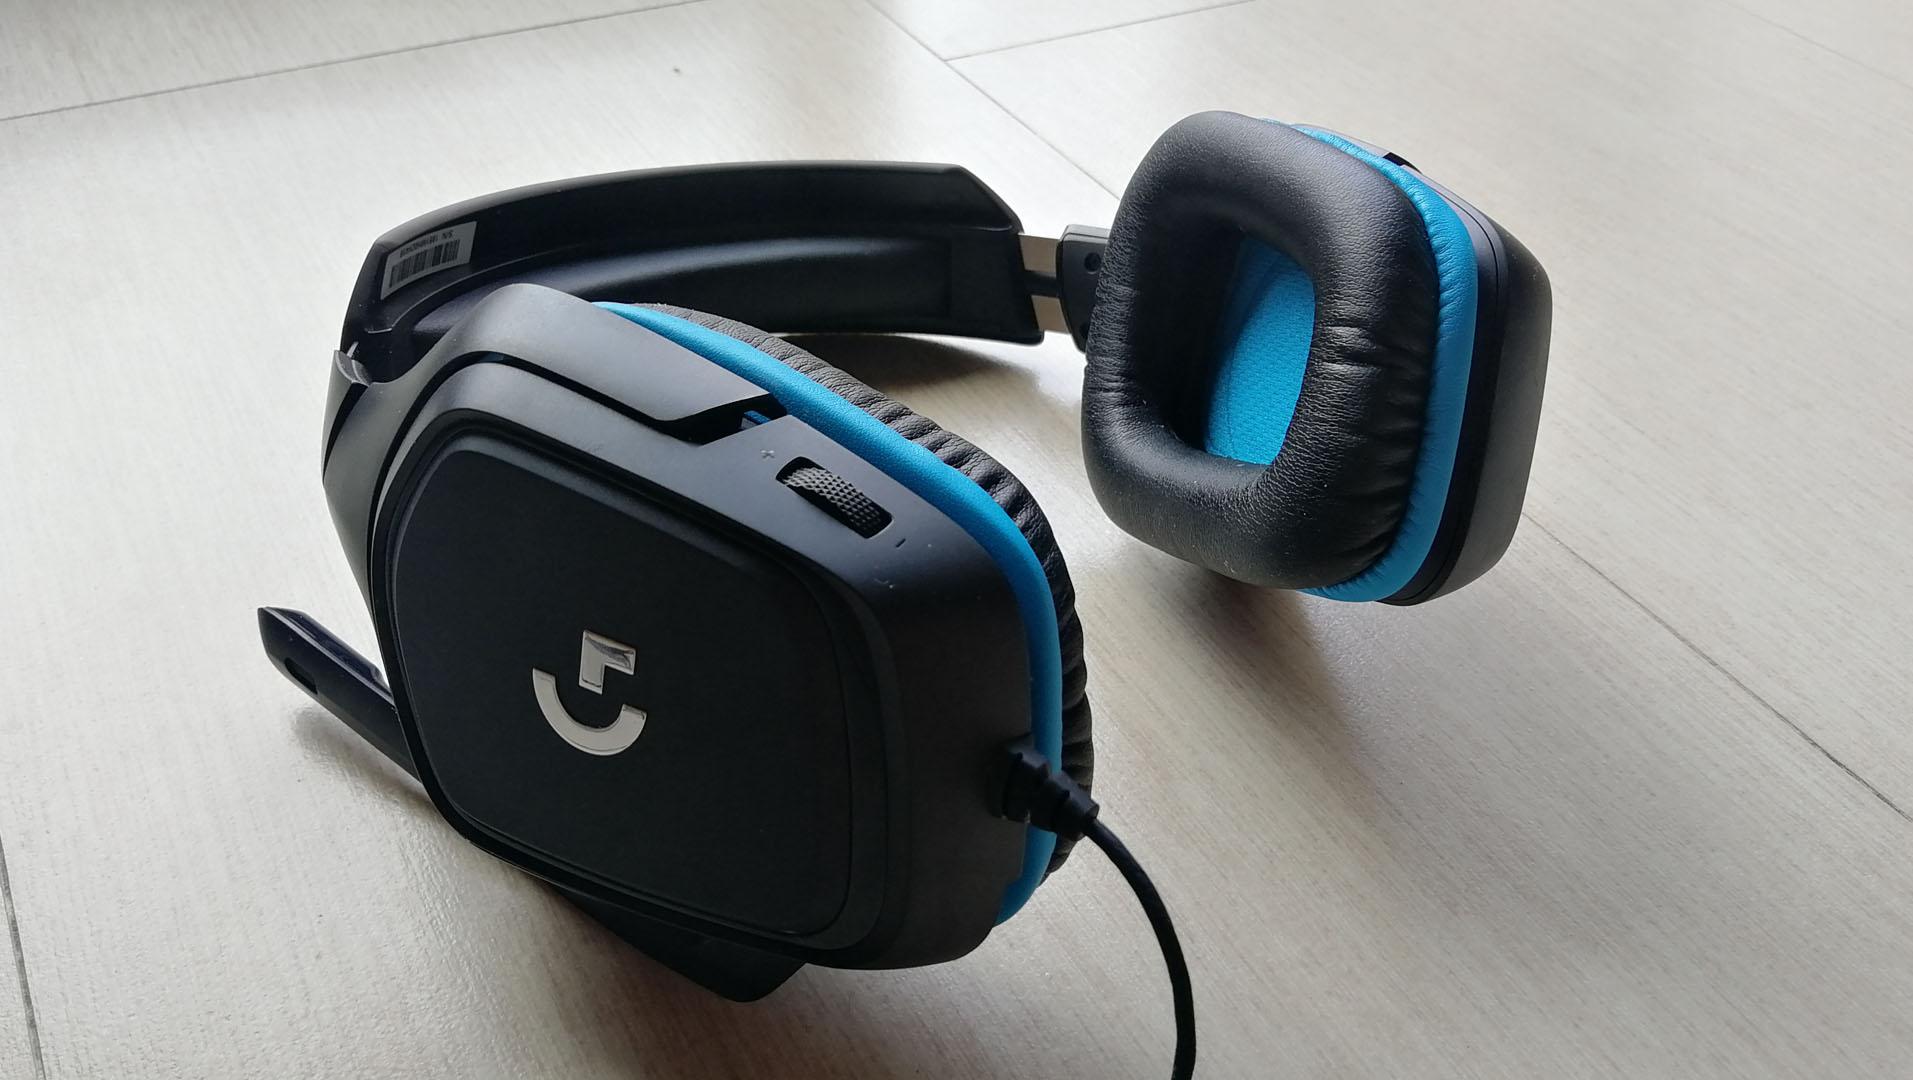 Recensione Logitech G432, headset con Dolby Surround 7.1 6